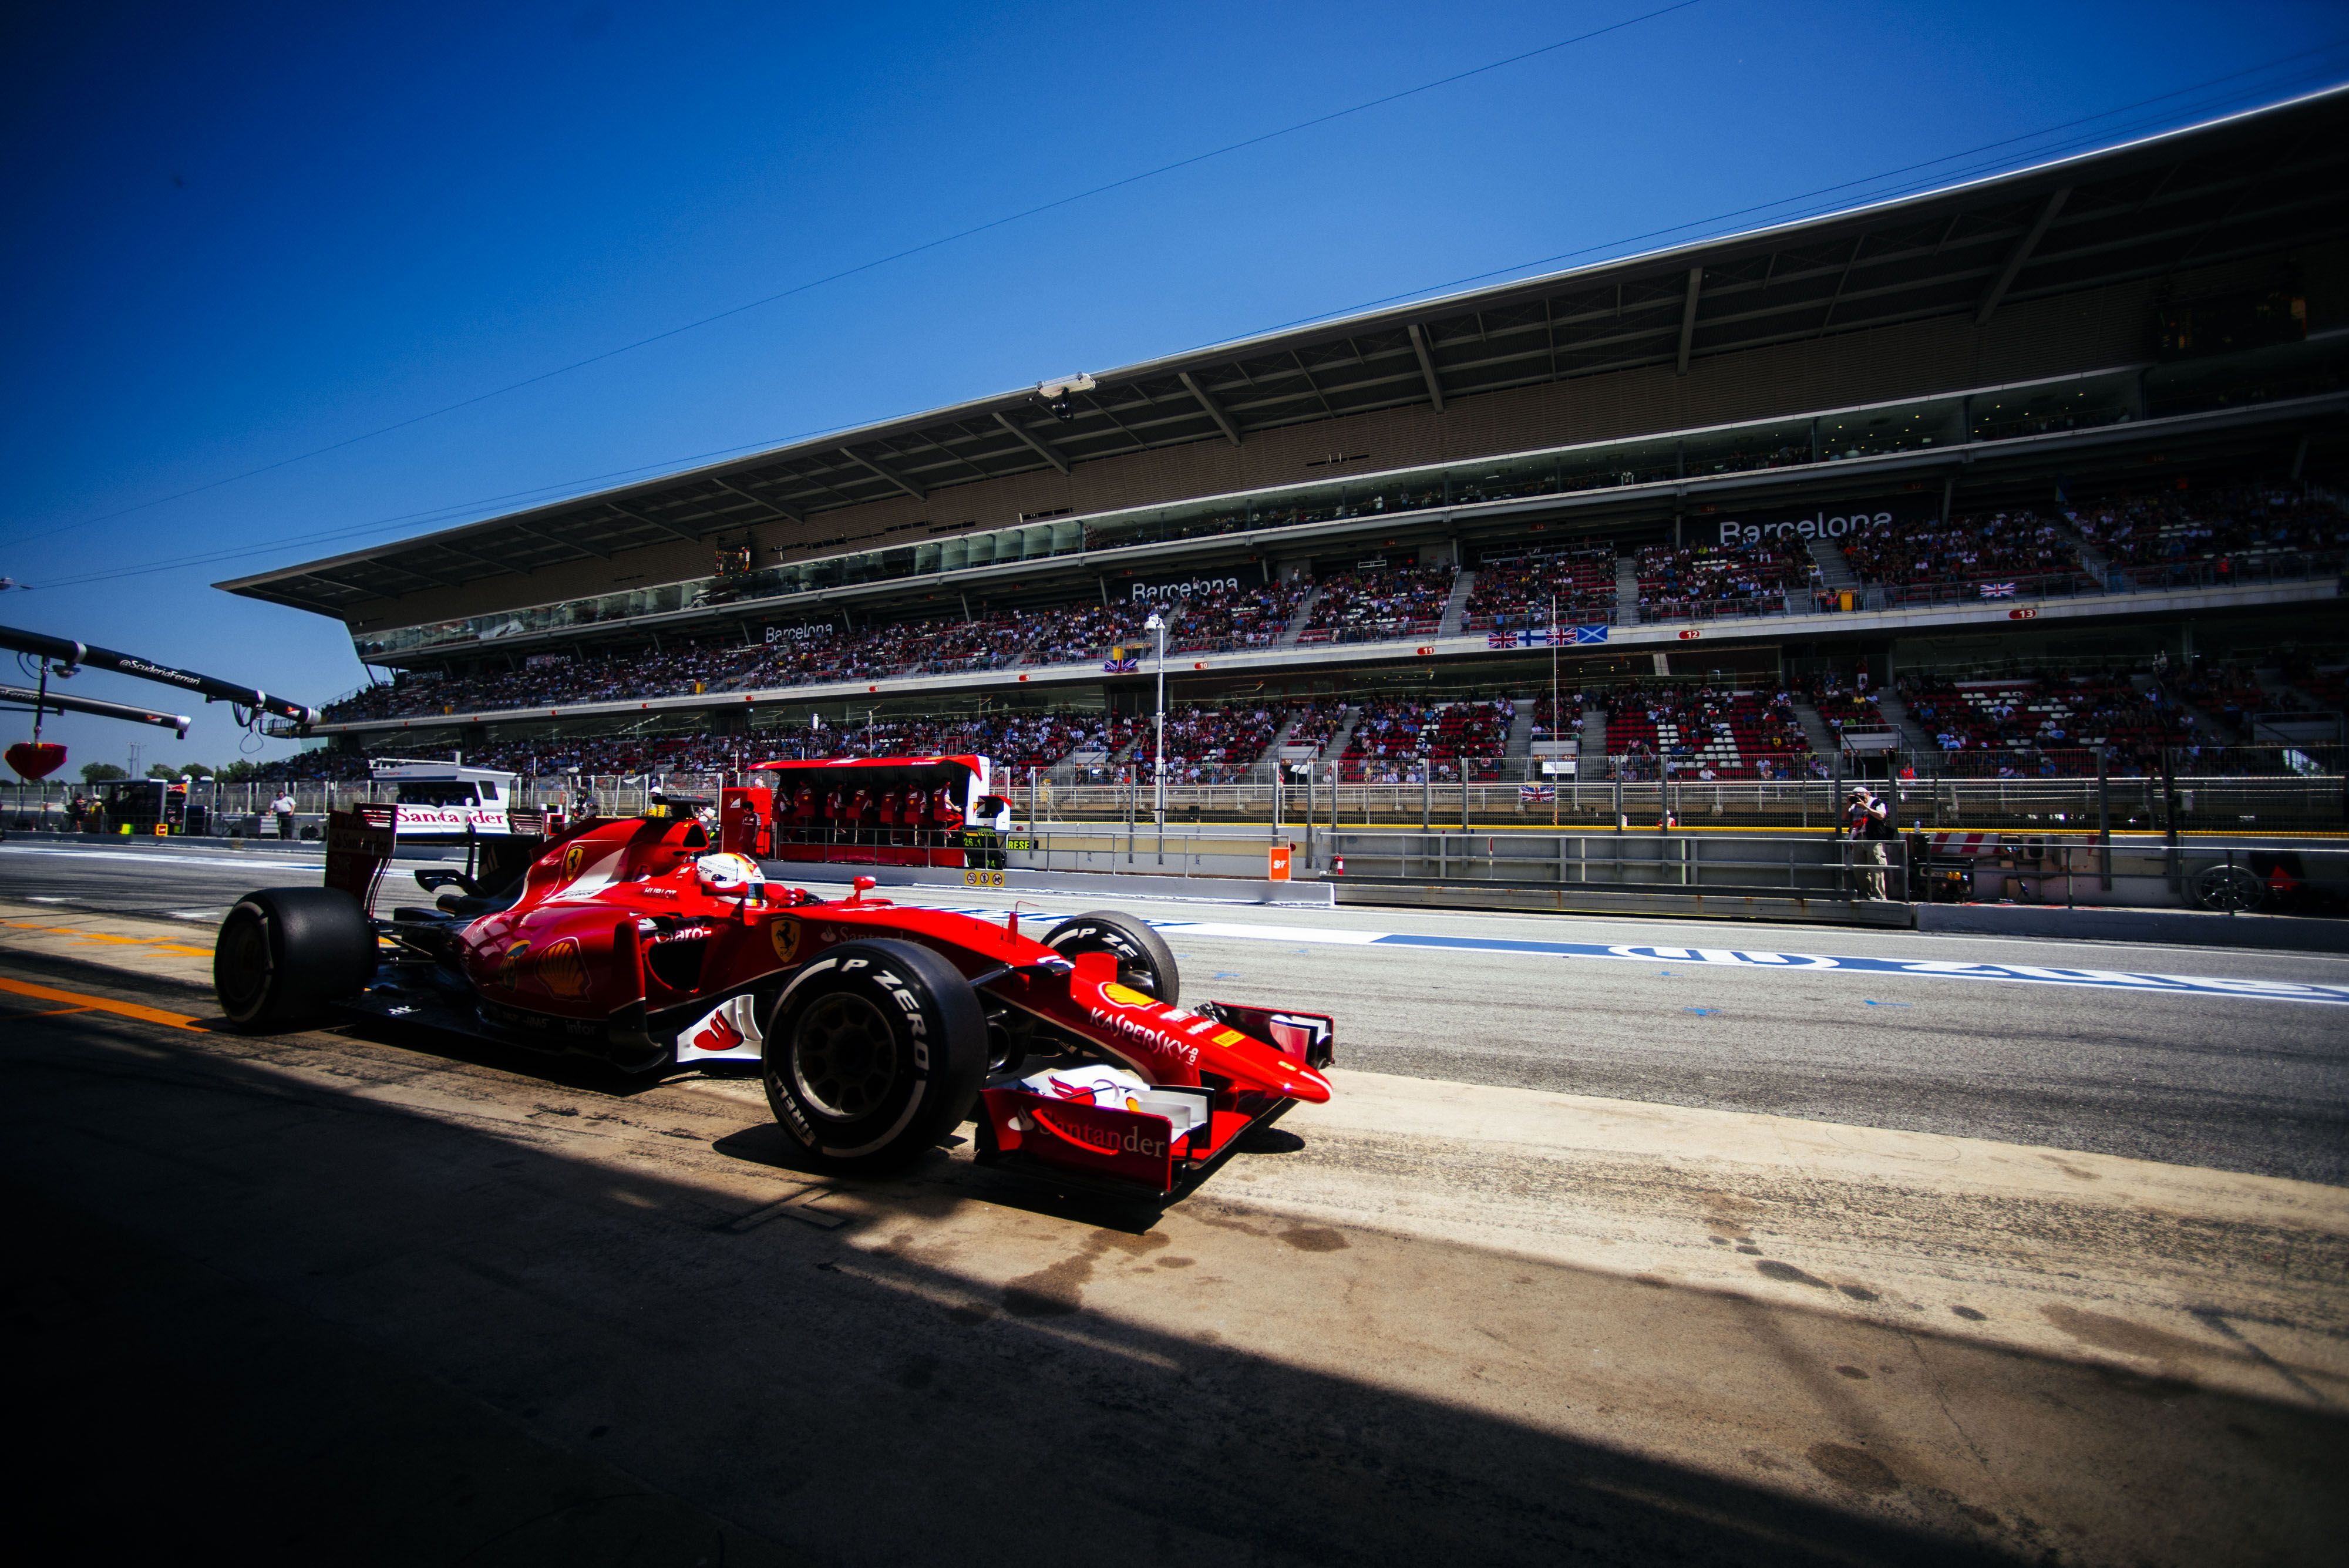 Spagna: Ferrari 3° e 7° in qualifica